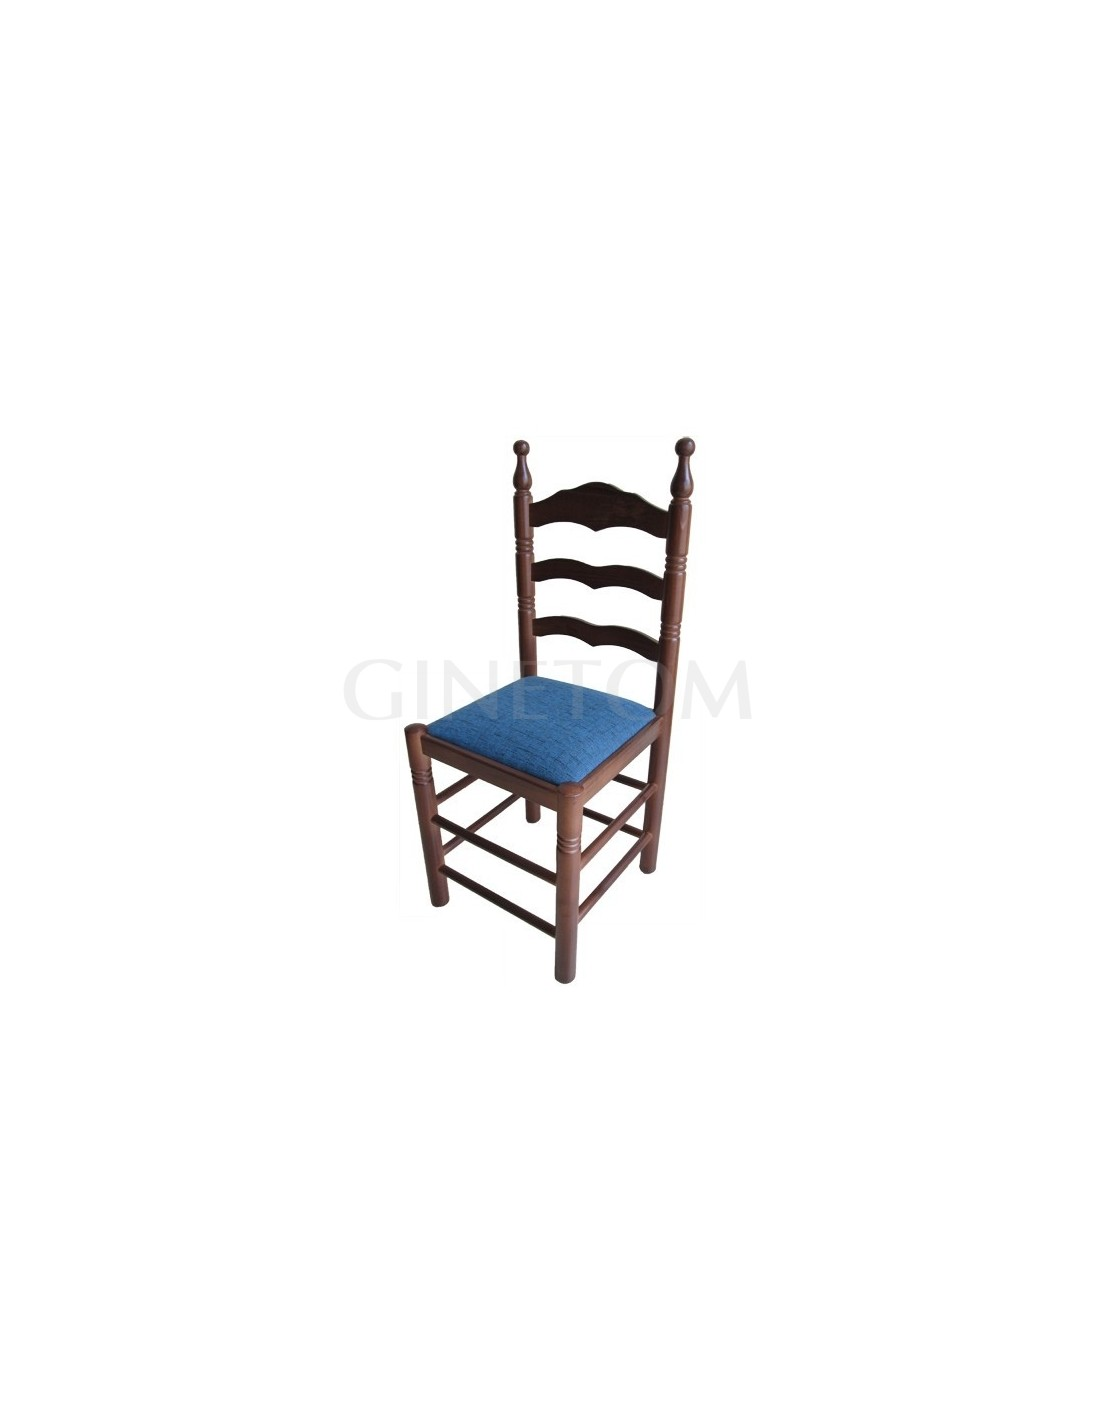 Silla de madera ref 190 sillas hosteler a de ginetom for Sillas hosteleria